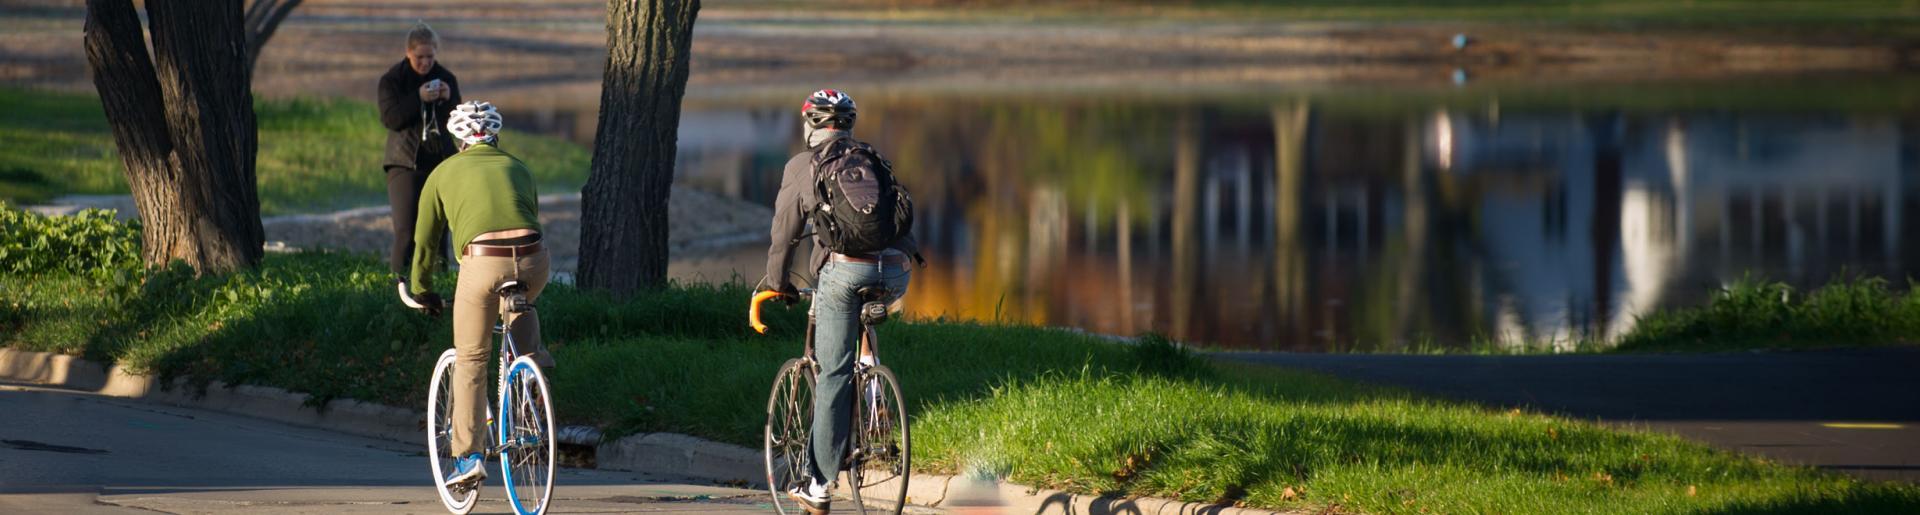 Tenney Park Biking